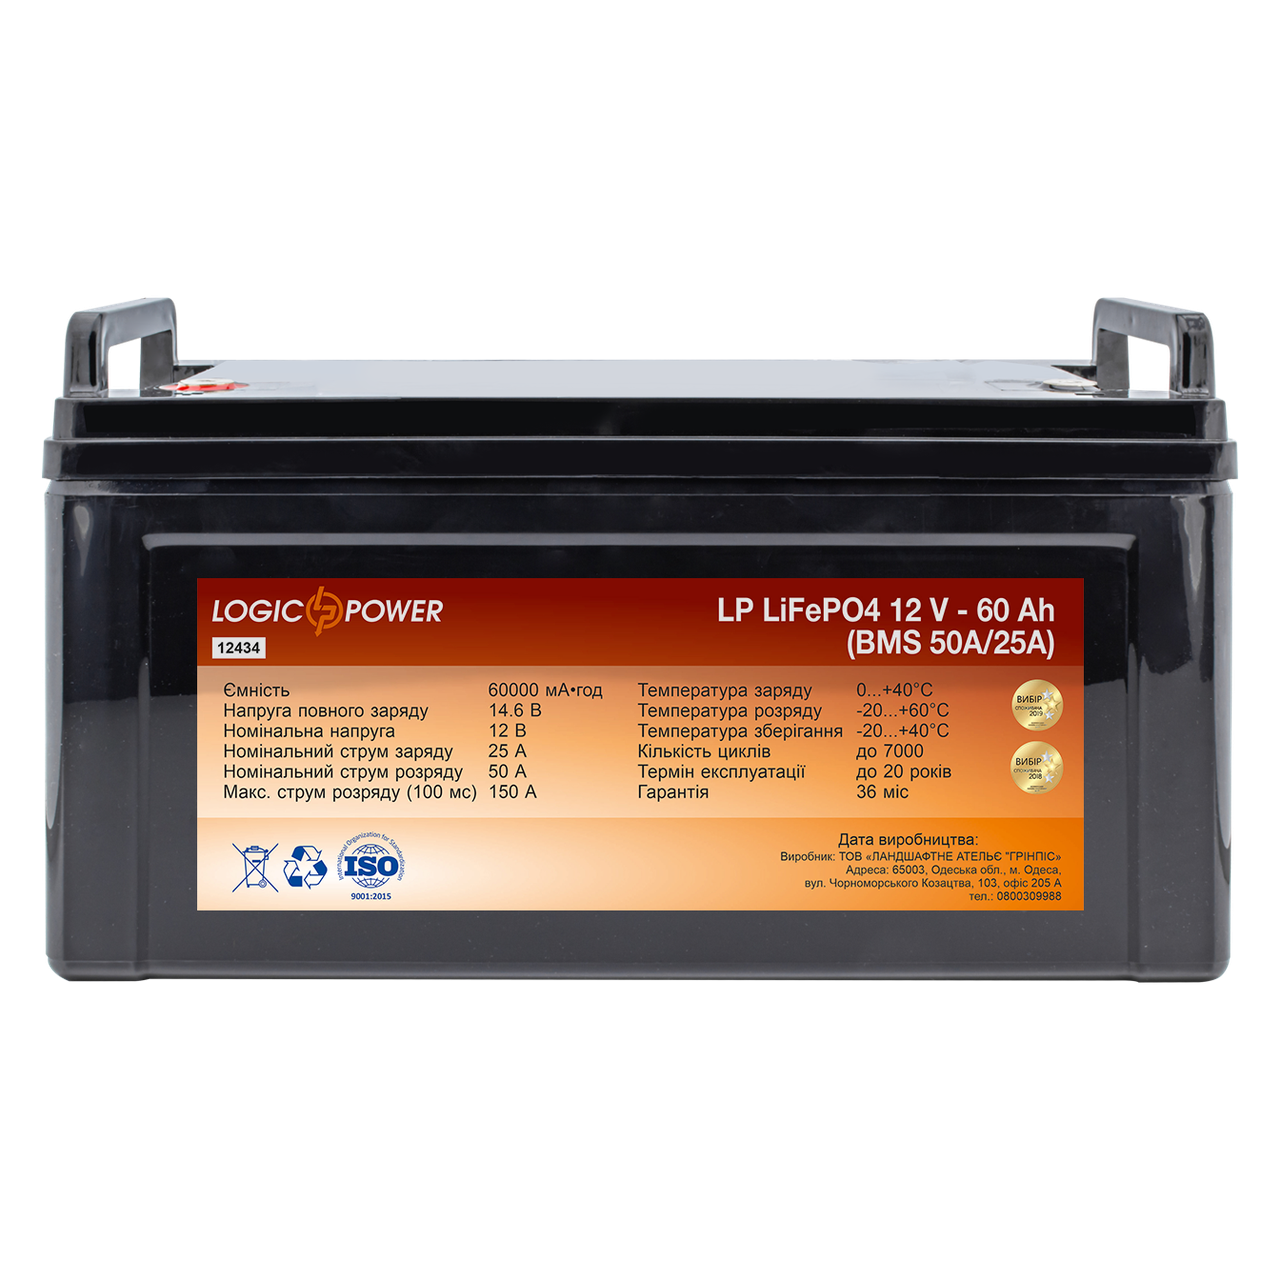 Аккумулятор LP LiFePO4 12 V - 60 Ah (BMS 50A/25А) пластик